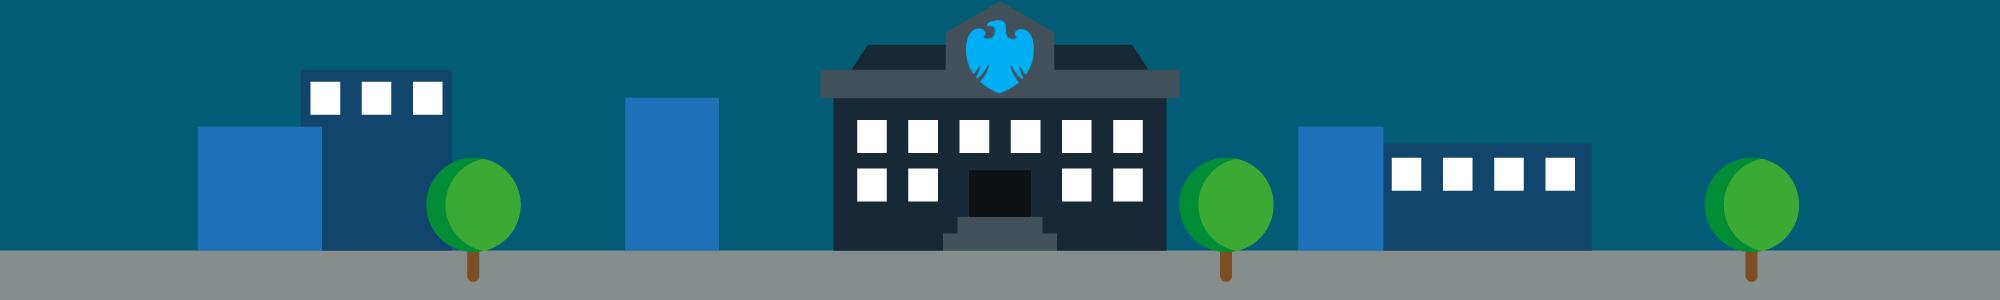 Barclays employee pension scheme